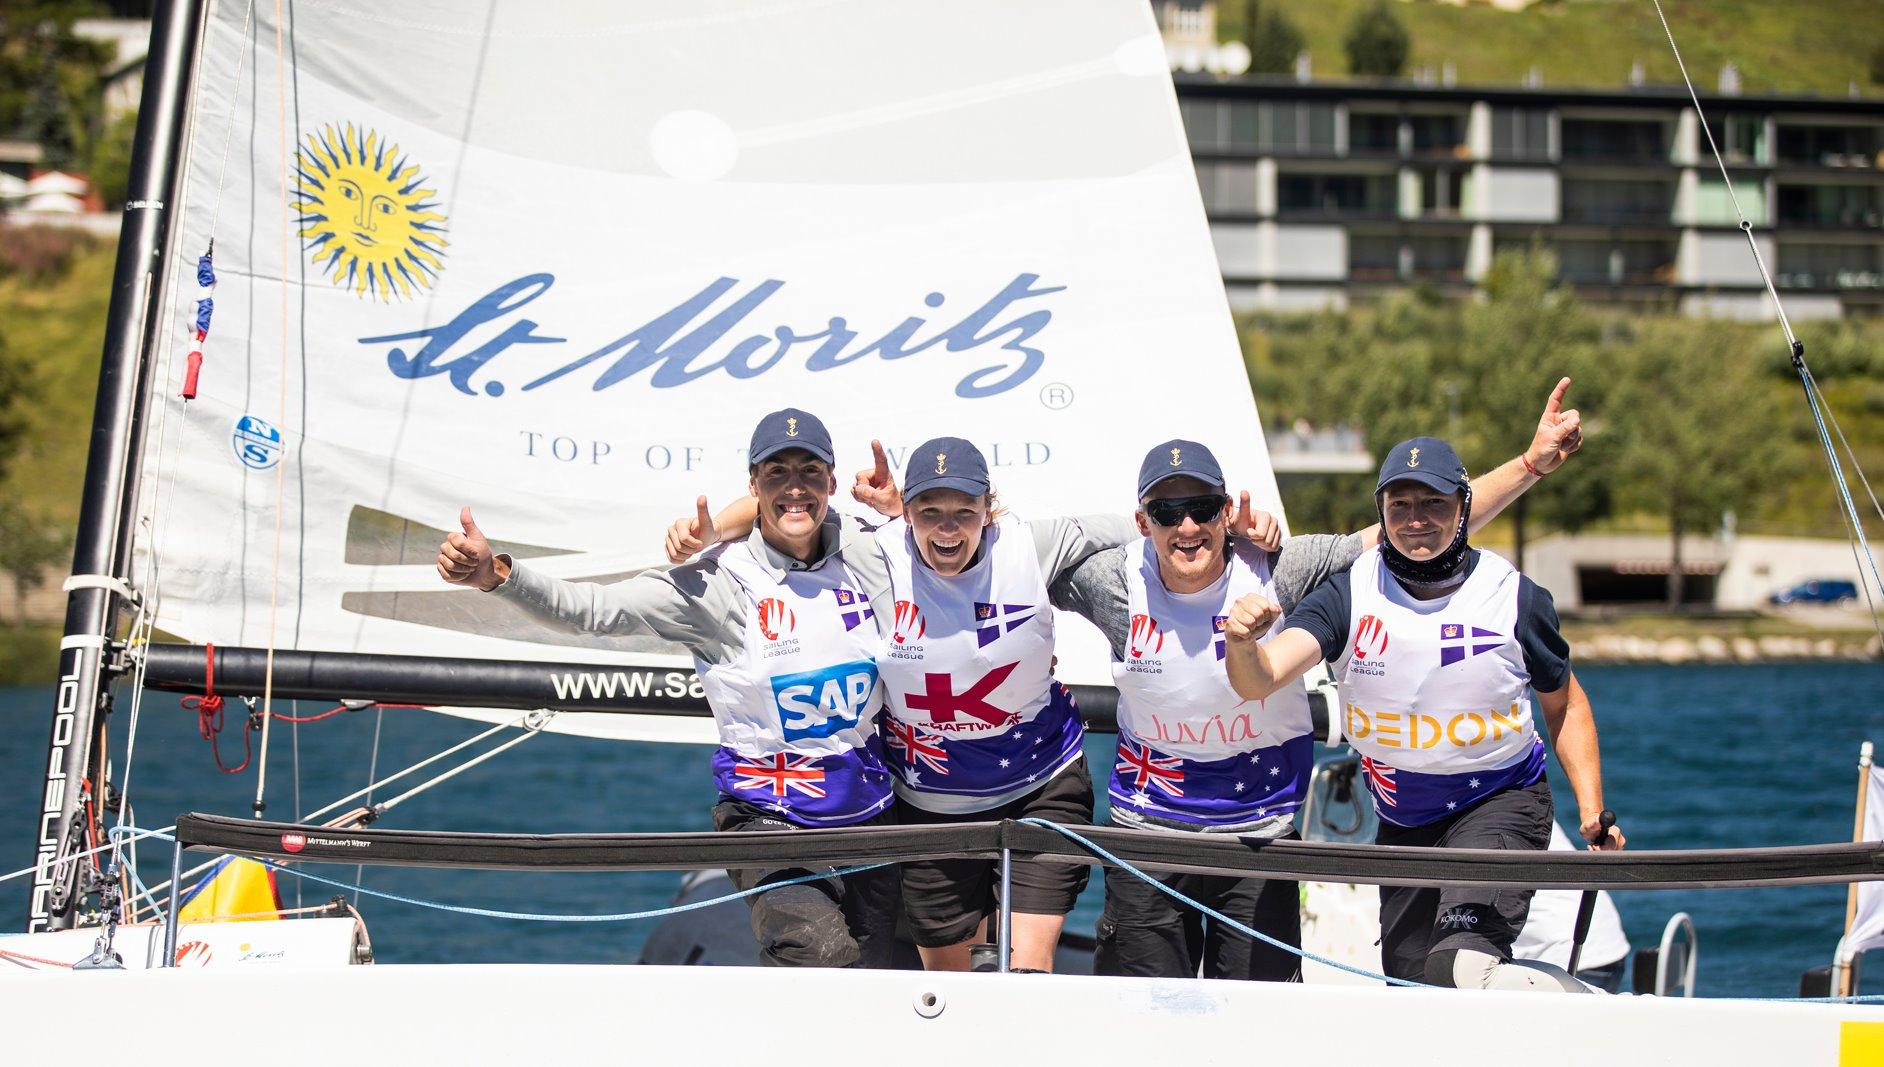 The winning crew at St. Moritz